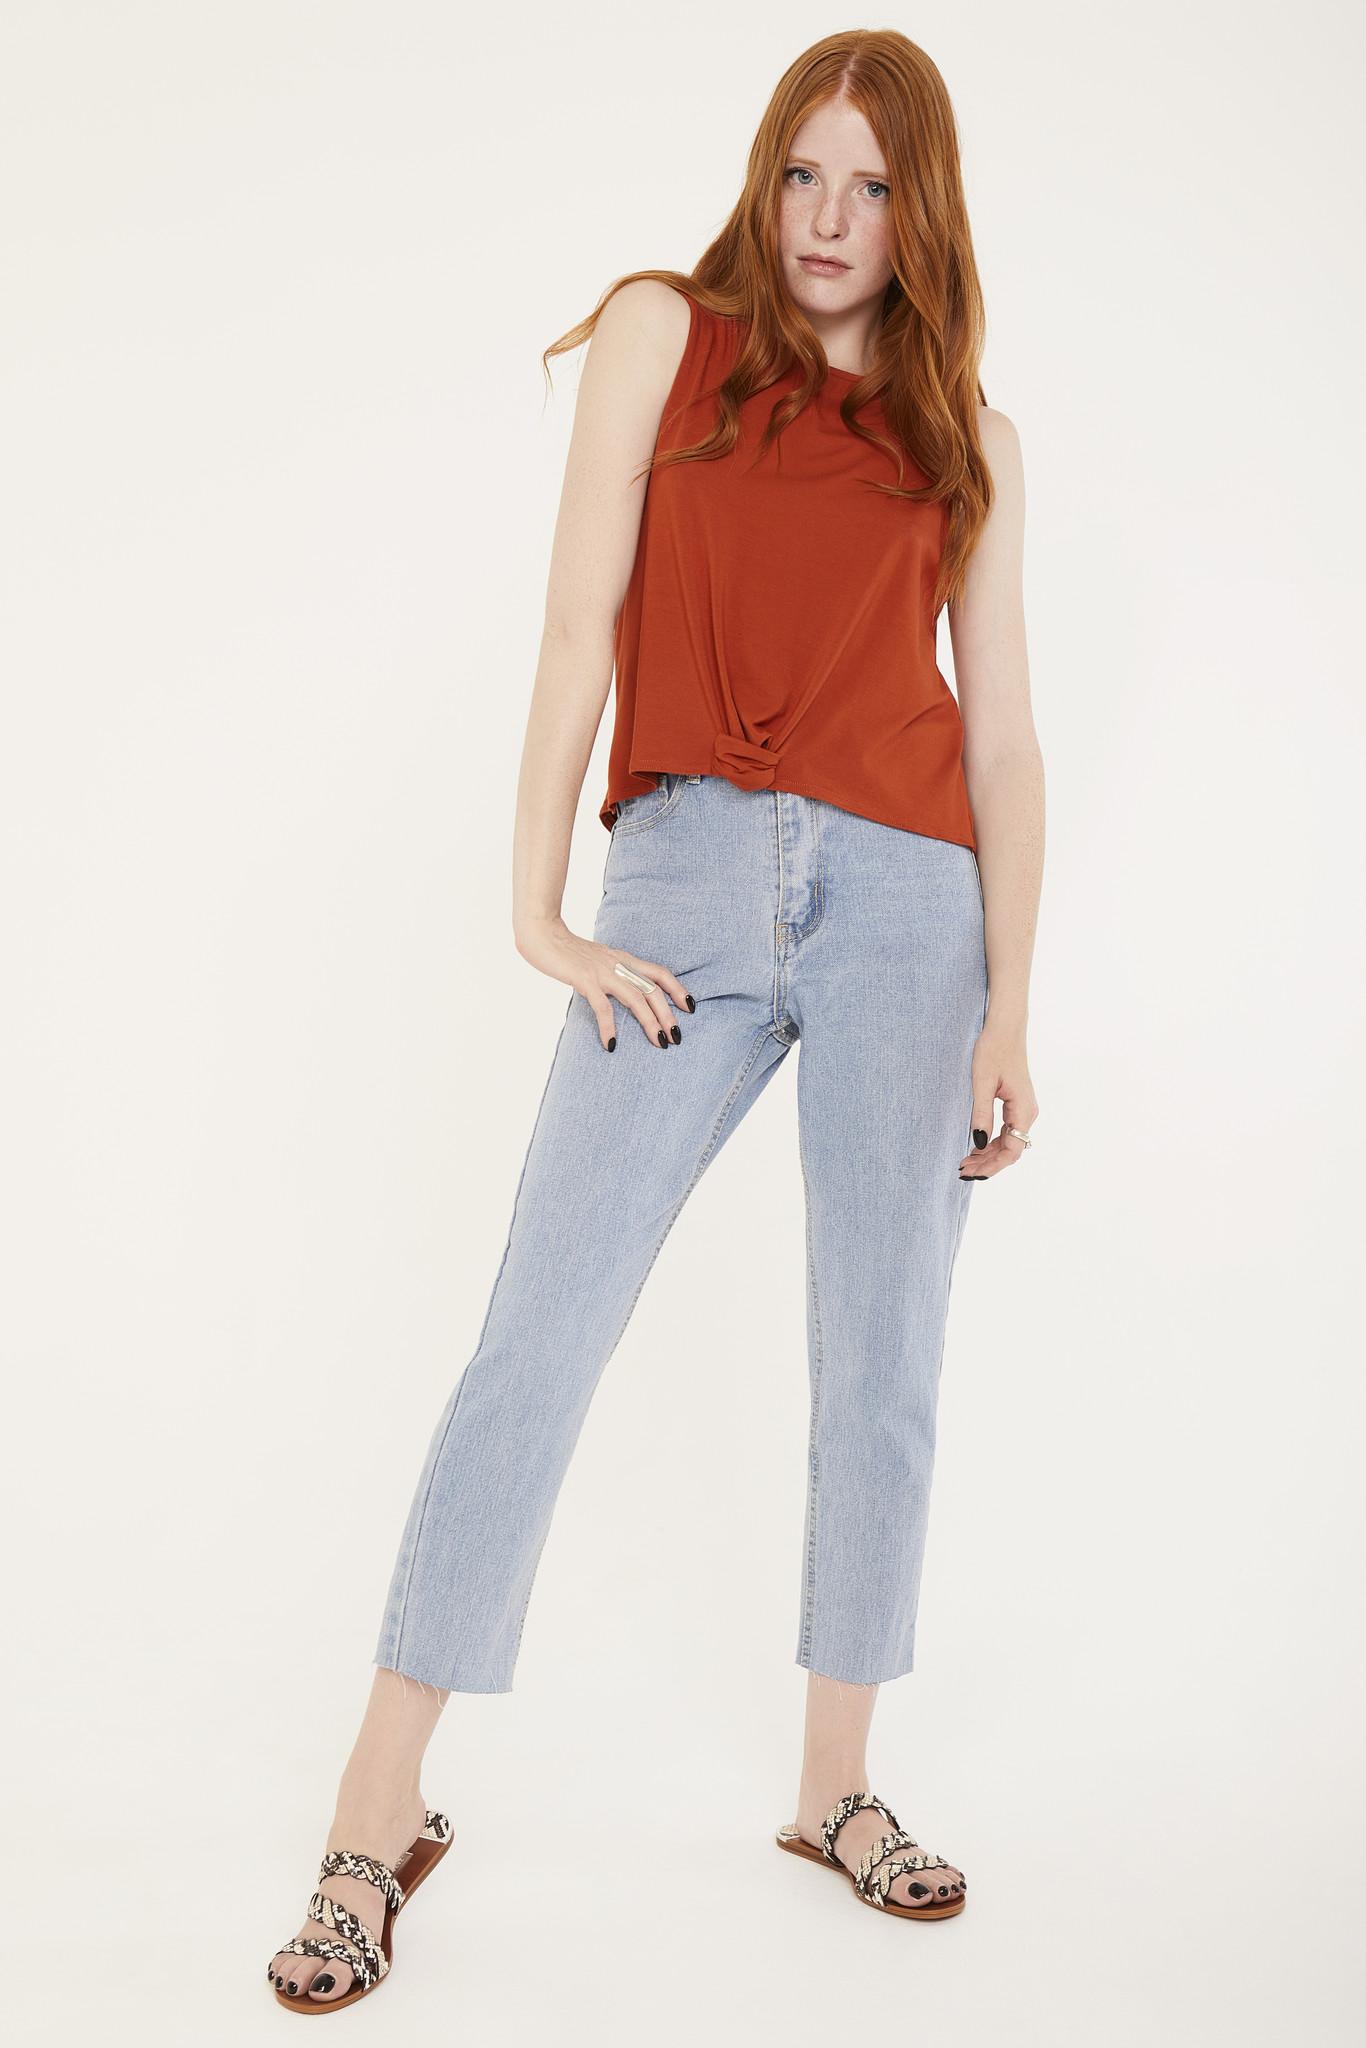 Lovan M Lena Jeans